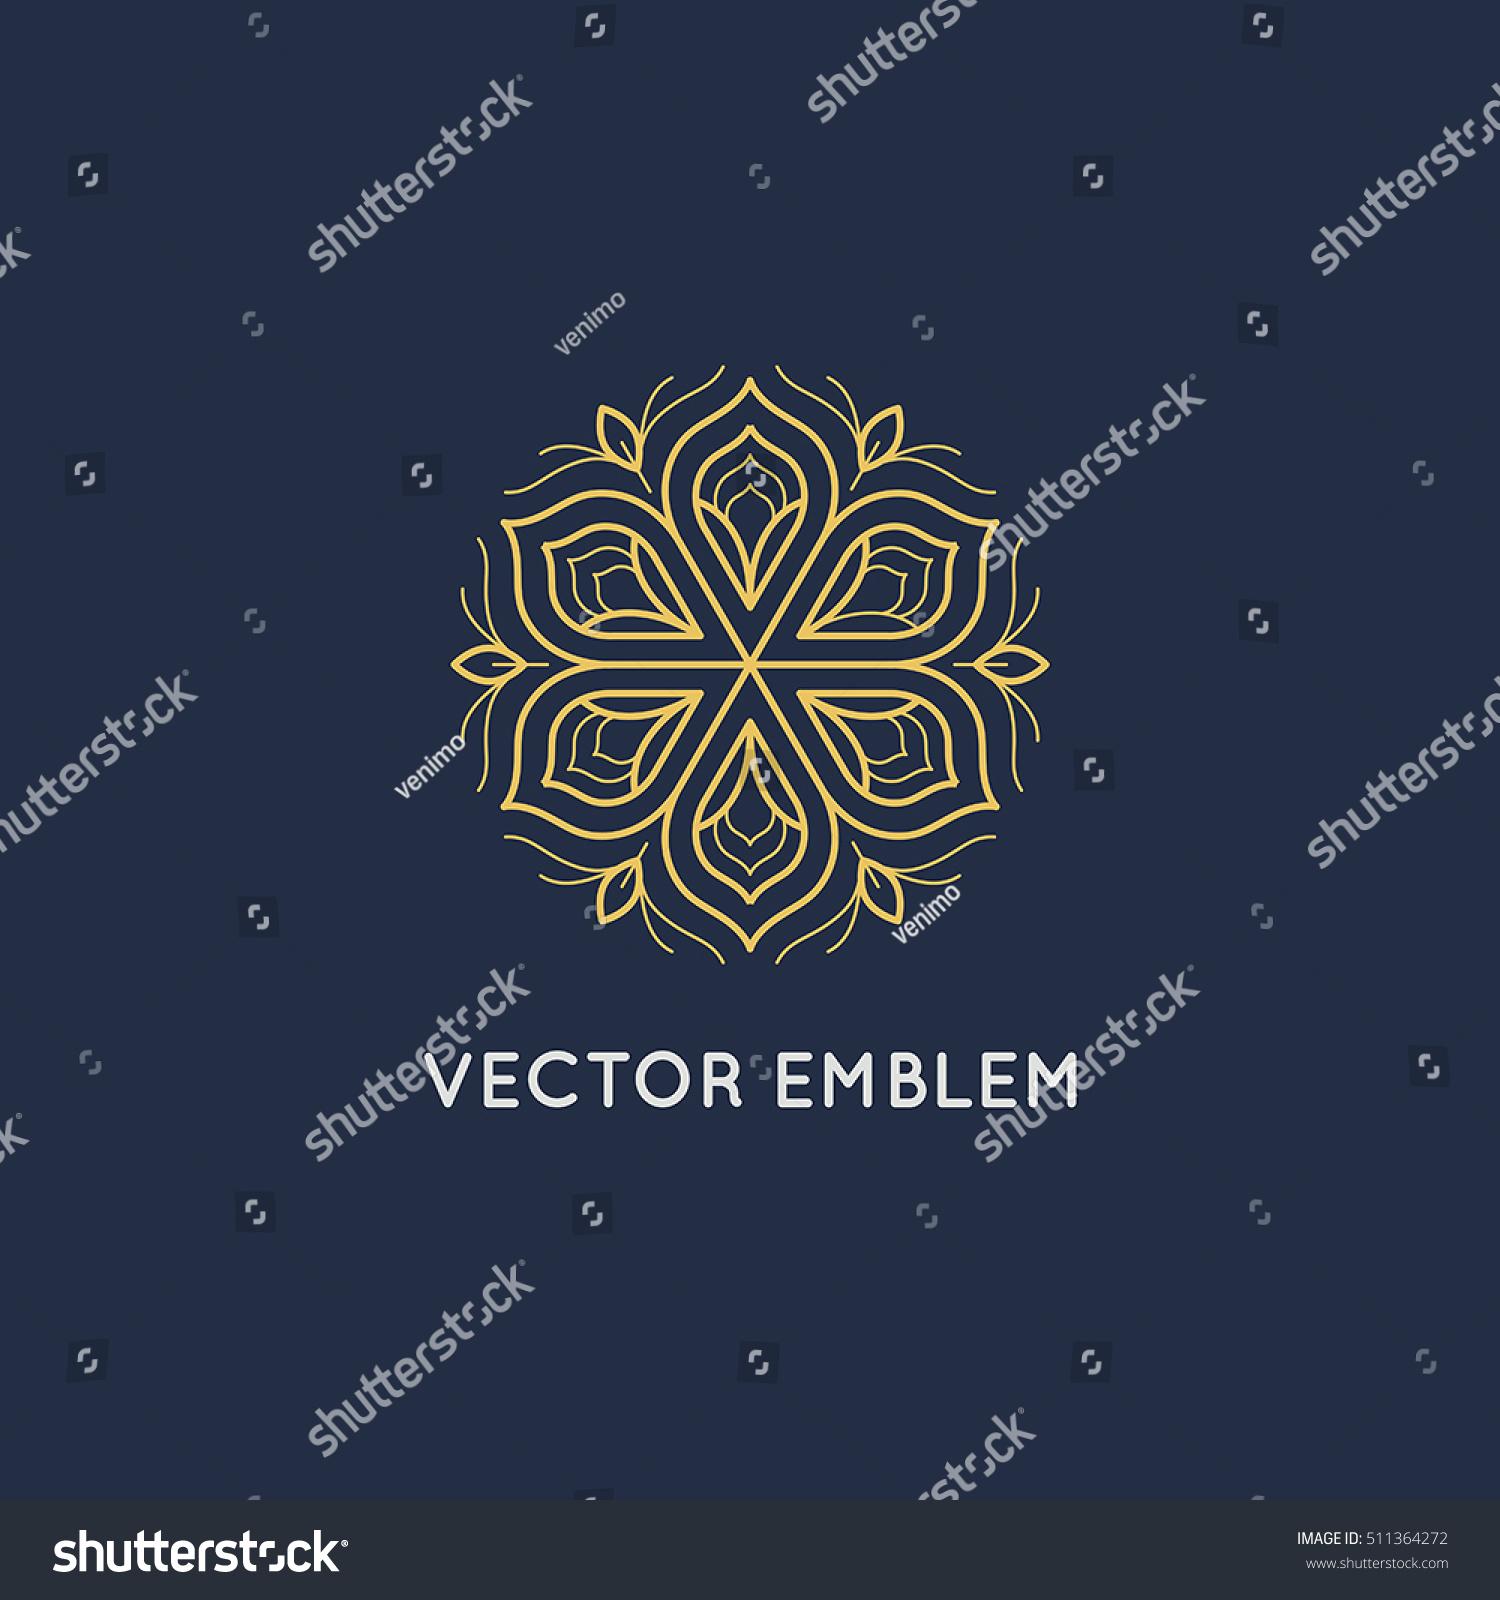 edit vectors free online vector logo shutterstock editor logo vector store logo vector software